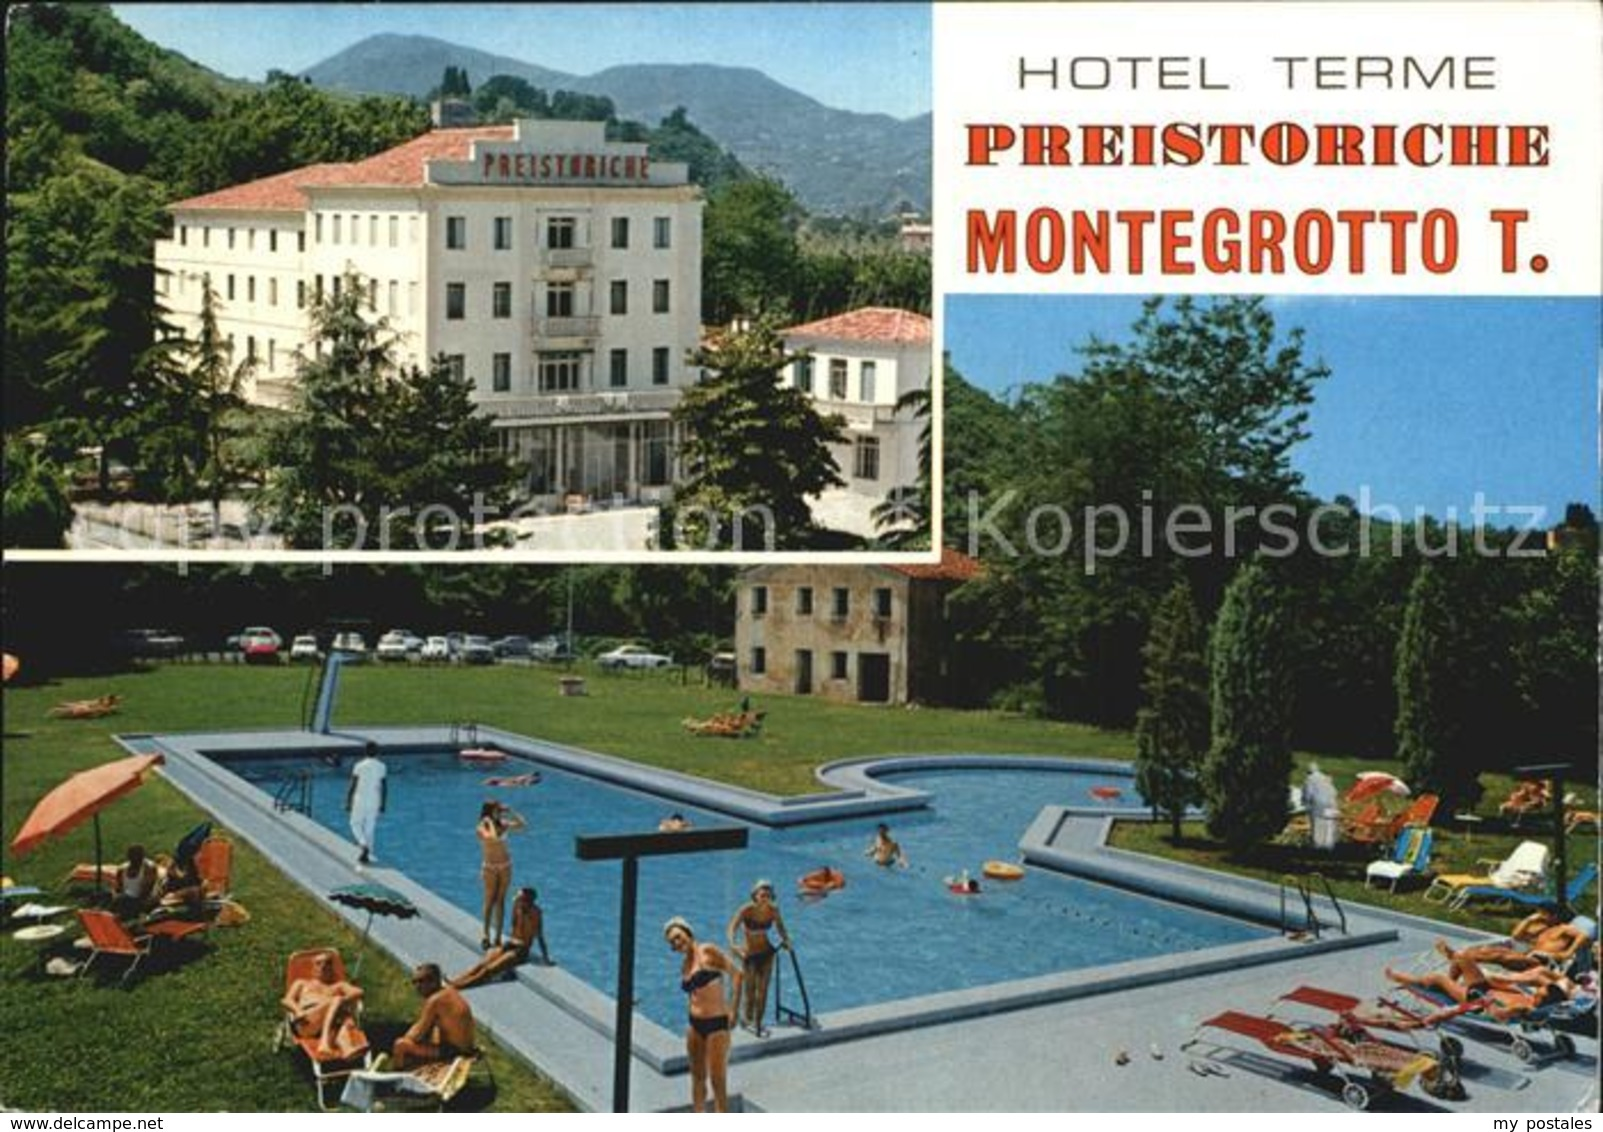 72570729 Montegrotto Terme Hotel Terme Preistoriche Firenze - Italie